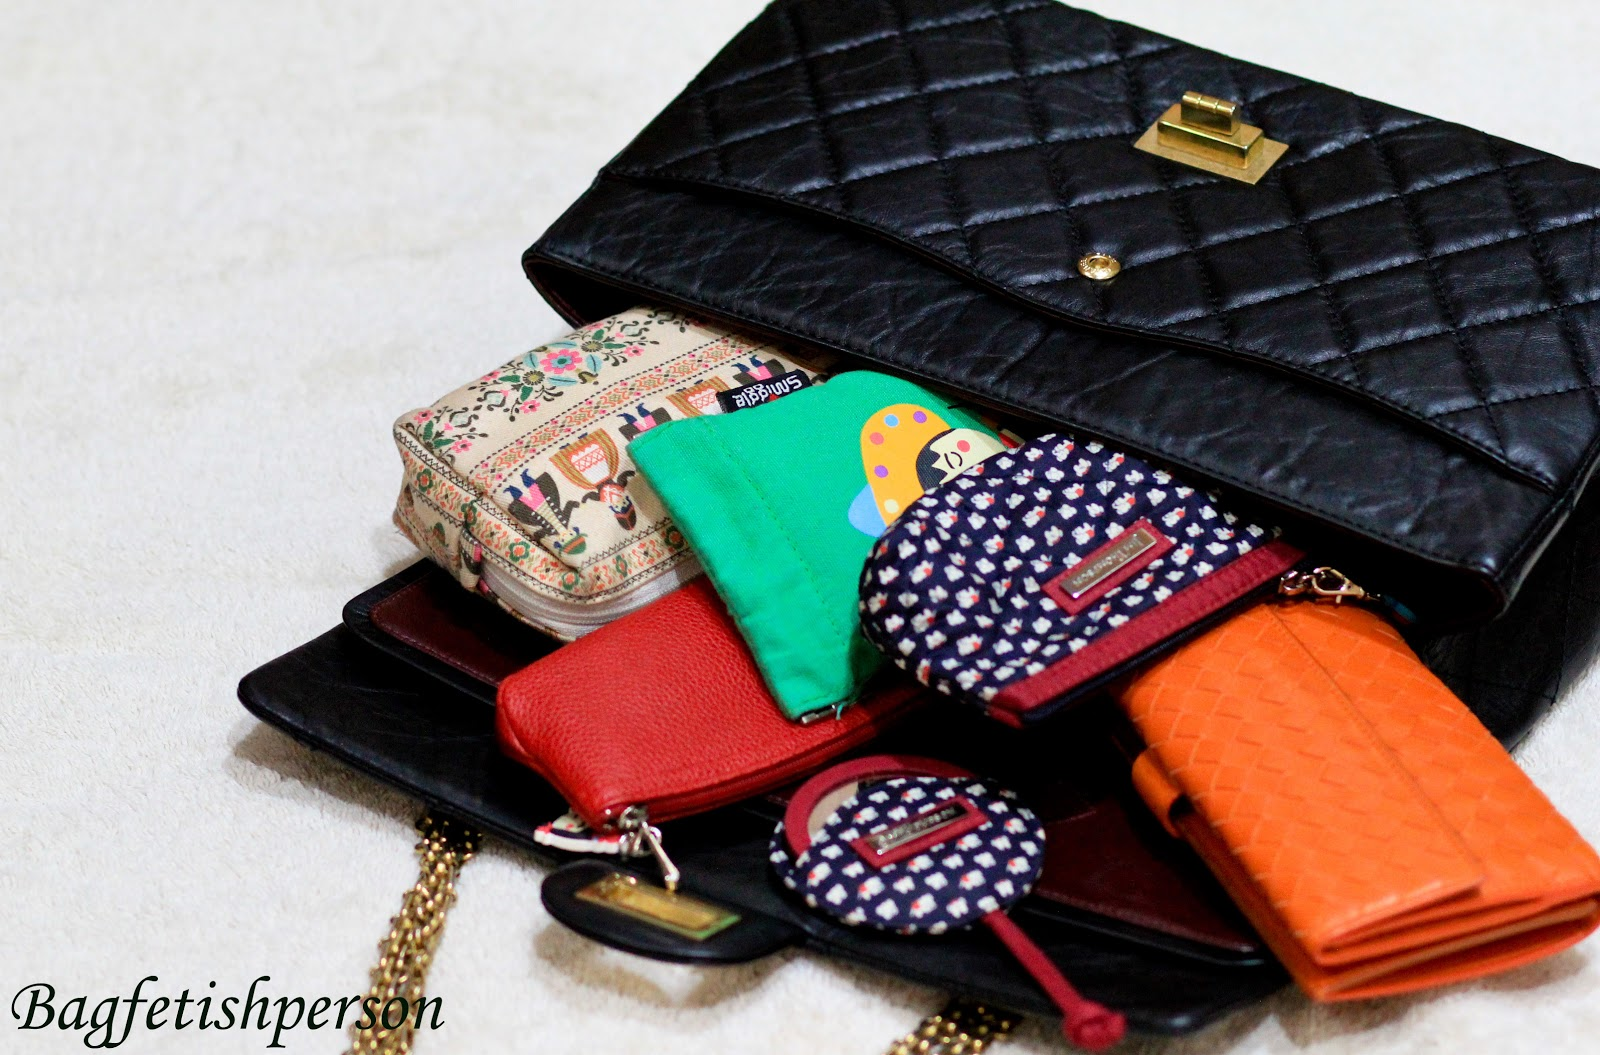 Bagfetishperson Inside My Bag Chanel Reissue In Black Matte